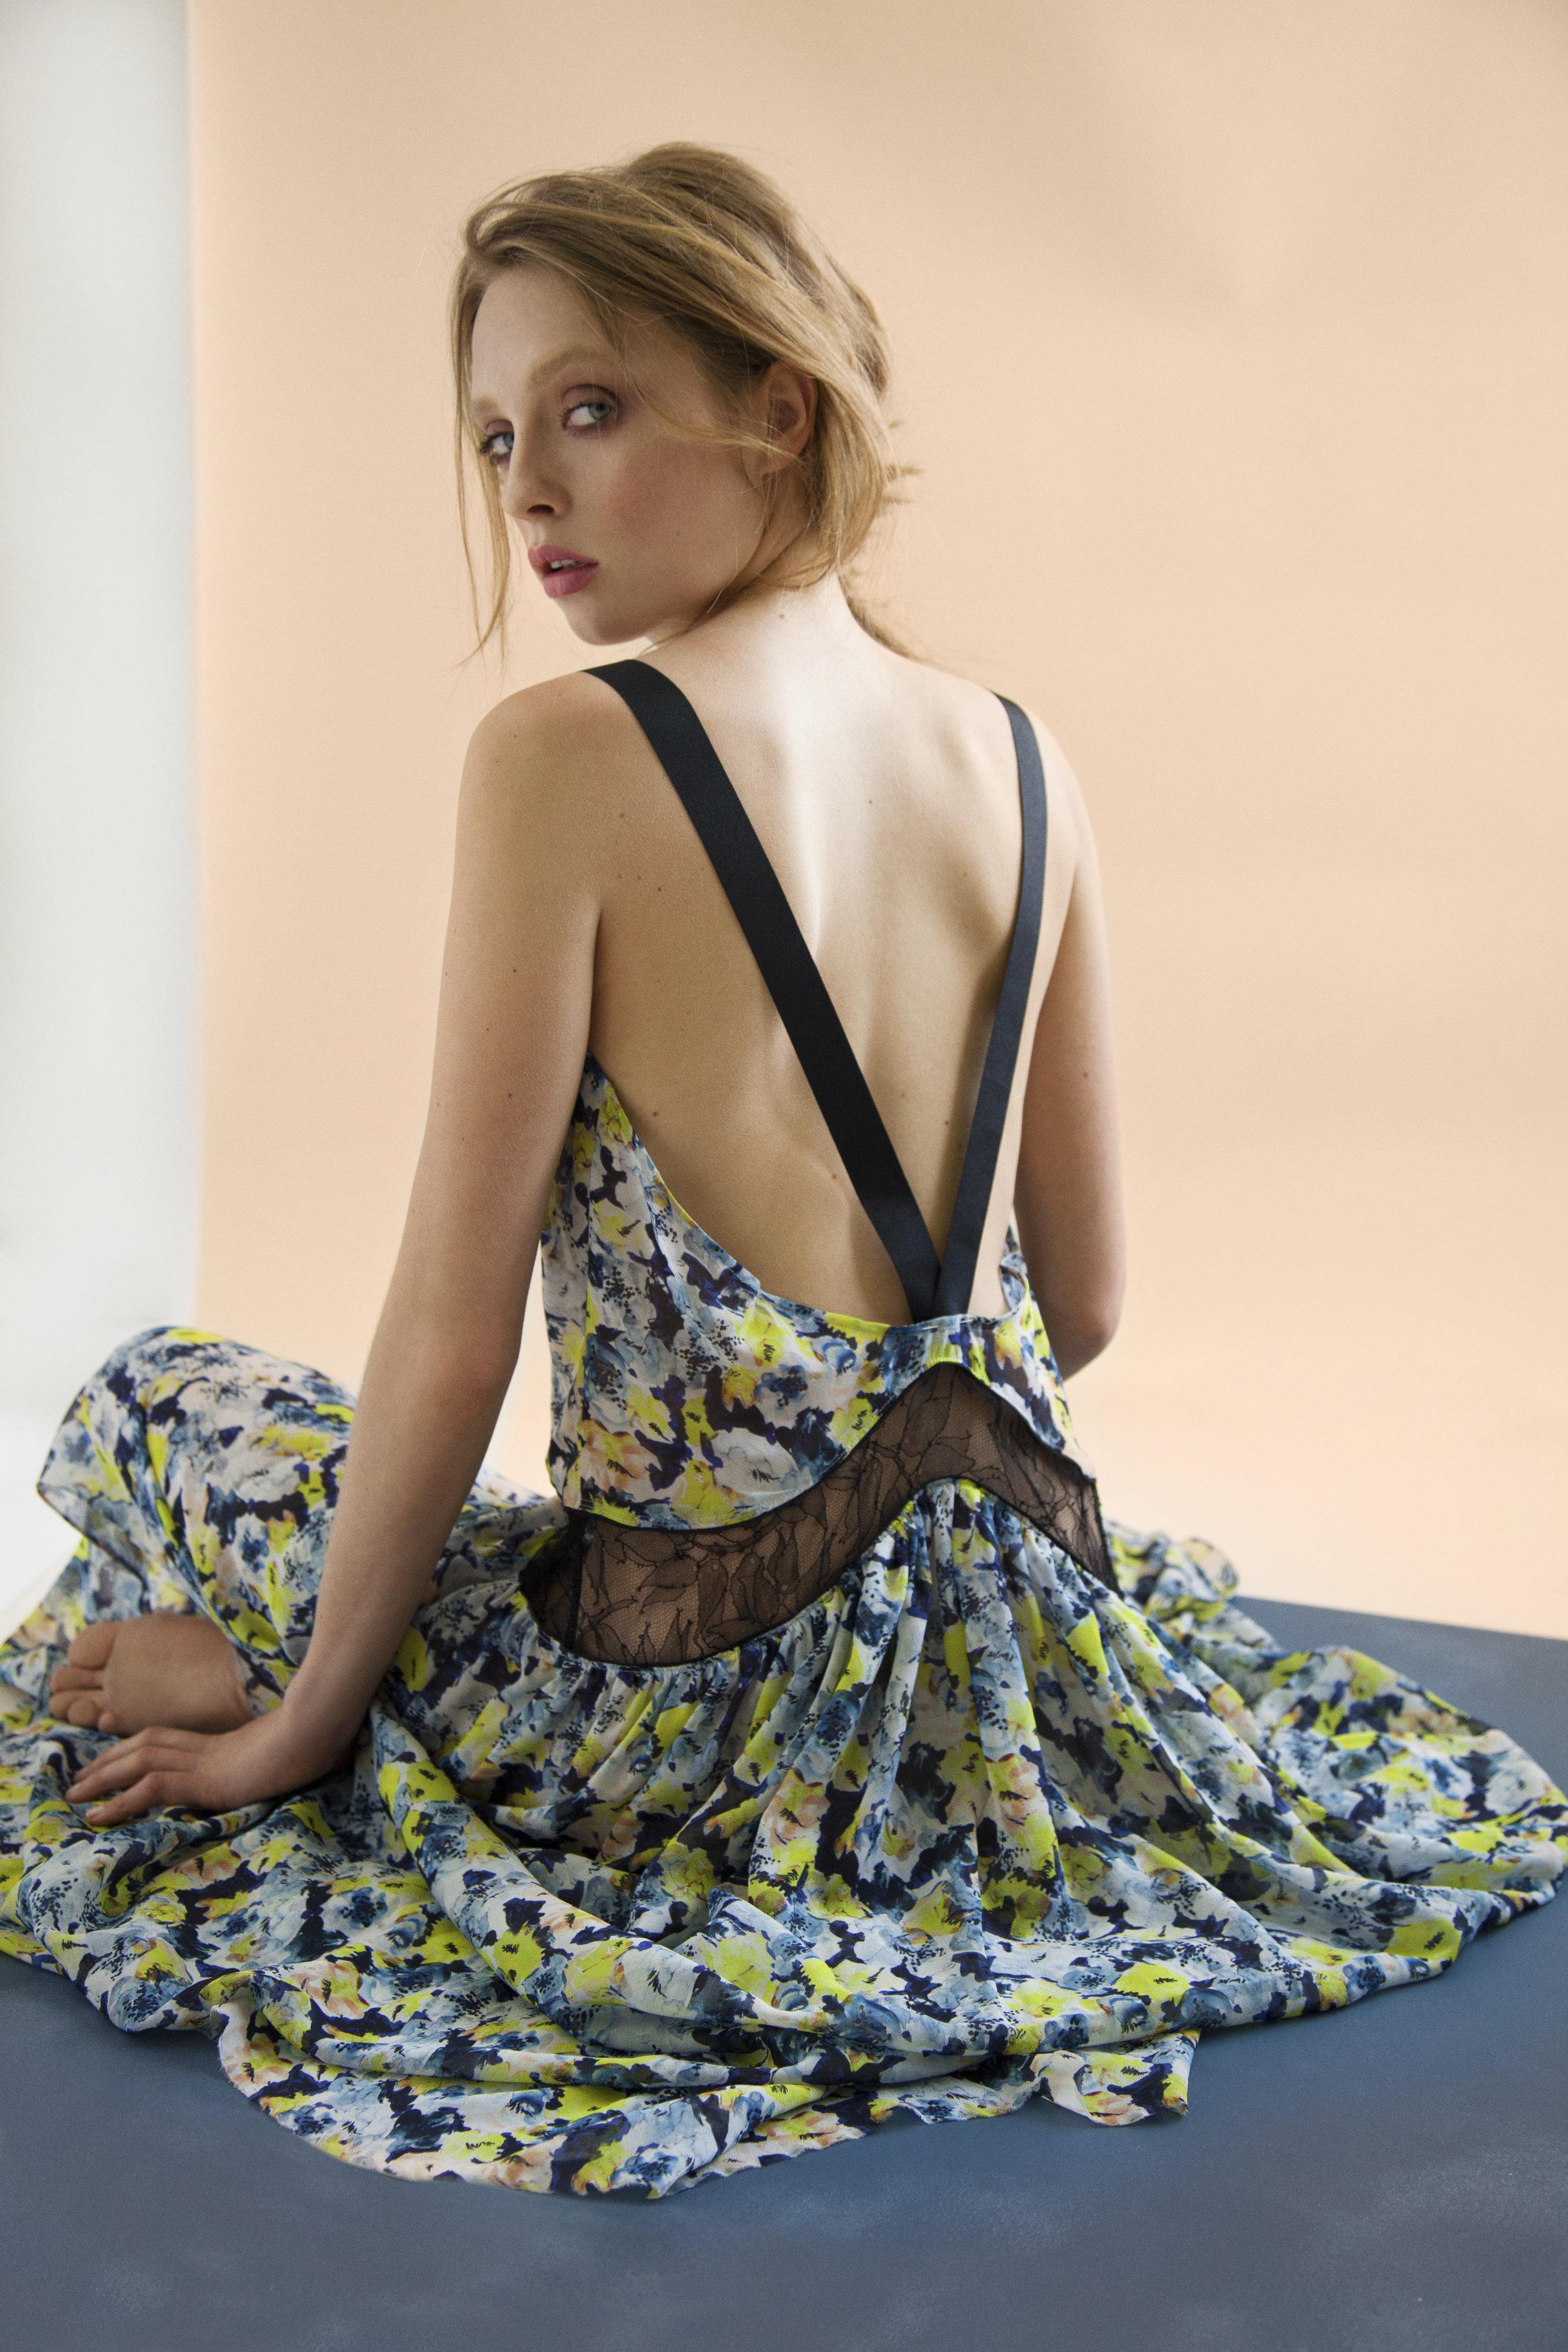 Stunning Silk Georgette Maxi Slip in Mariposa Print by Violet & Wren. Image Courtesy of Anthropologie